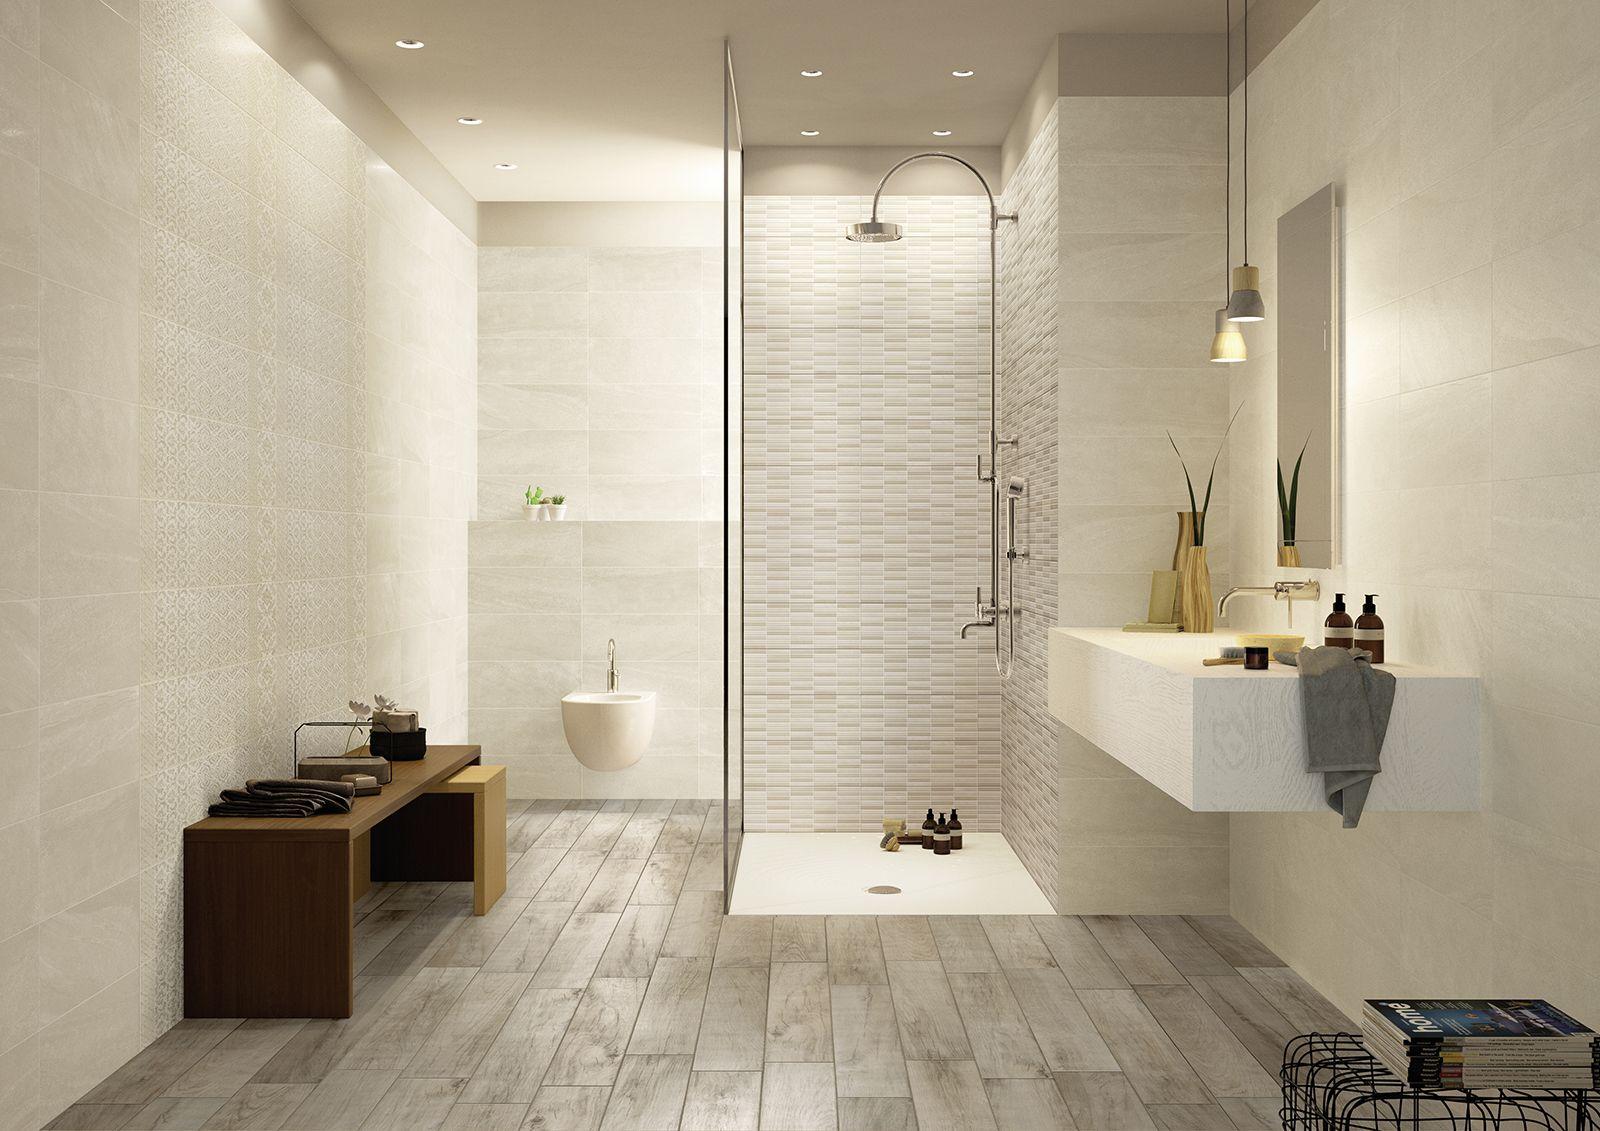 Interiors ceramic tiles Marazzi_6173 | Bathroom | Pinterest | Wall ...